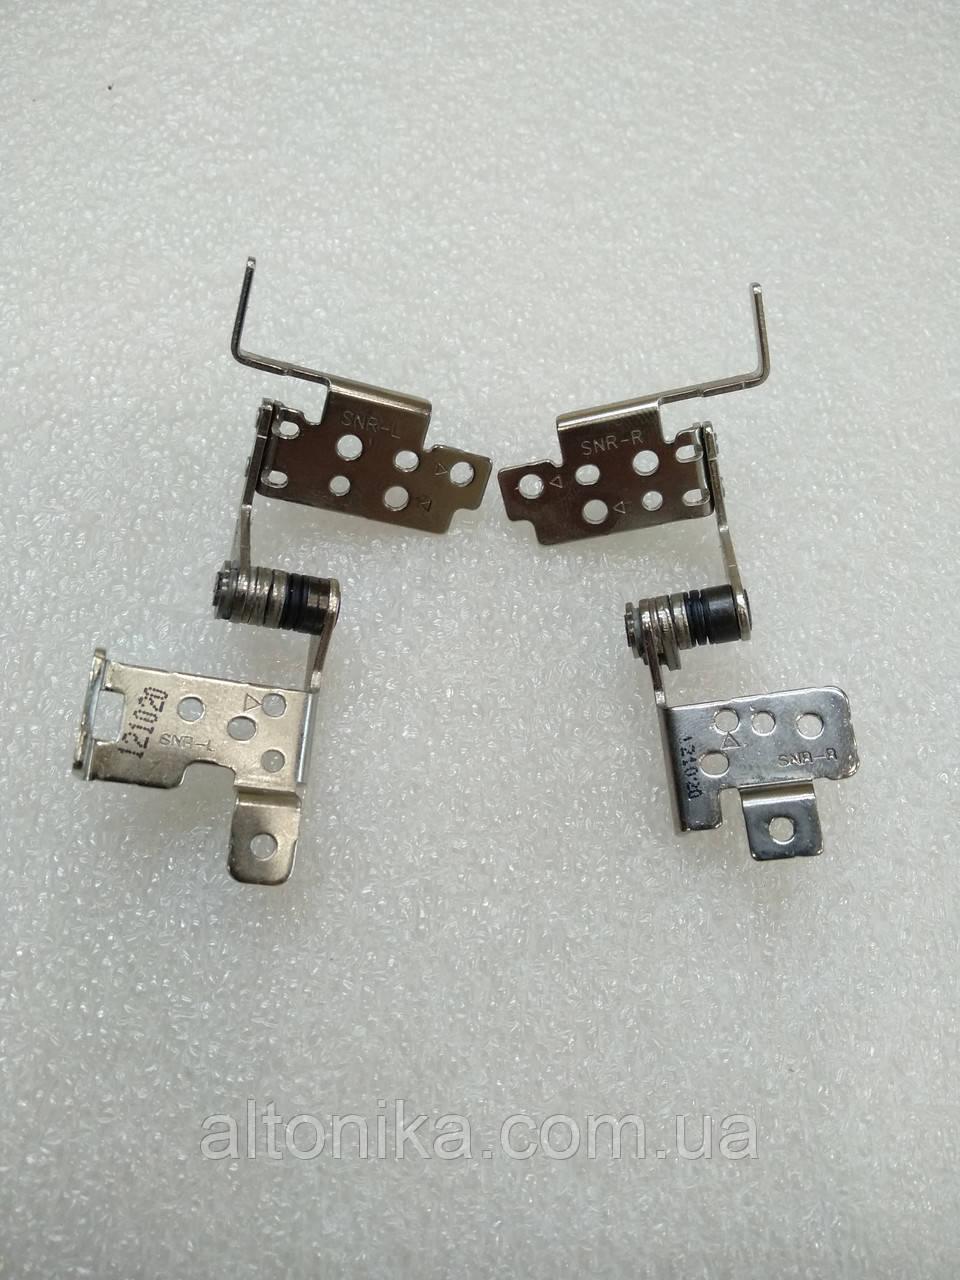 Петли для ноутбка Asus X301 X301A X301A-1B (левая+правая) Оригинал